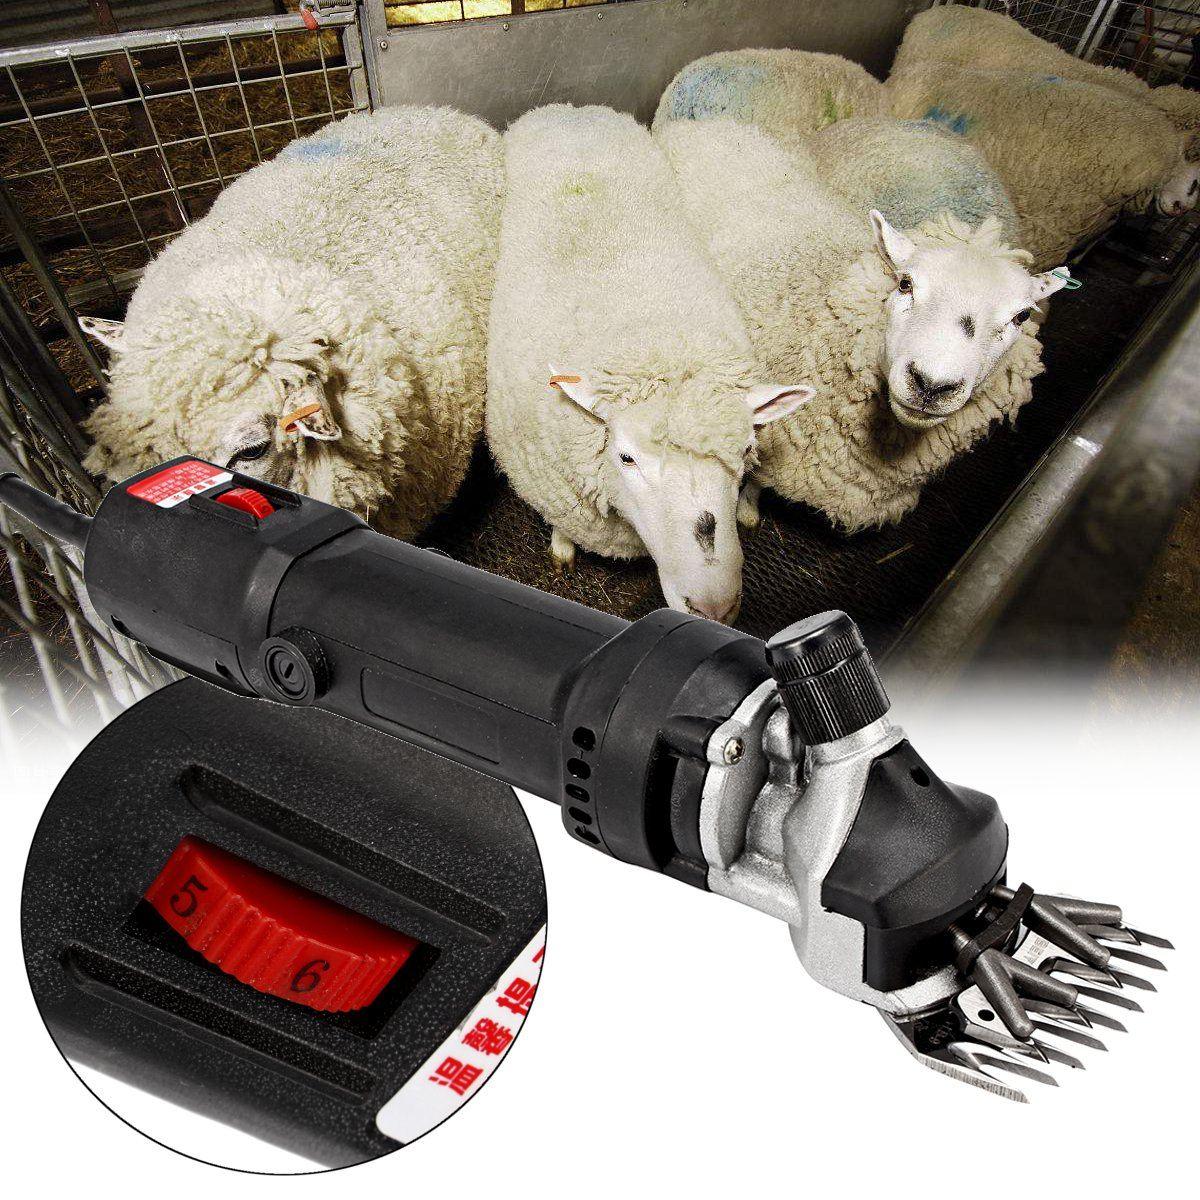 690W 6 Level Speed Electric Shears Shearing Hair Clipper Animal Sheep Goat Pet Farm Machine Scissor690W 6 Level Speed Electric Shears Shearing Hair Clipper Animal Sheep Goat Pet Farm Machine Scissor